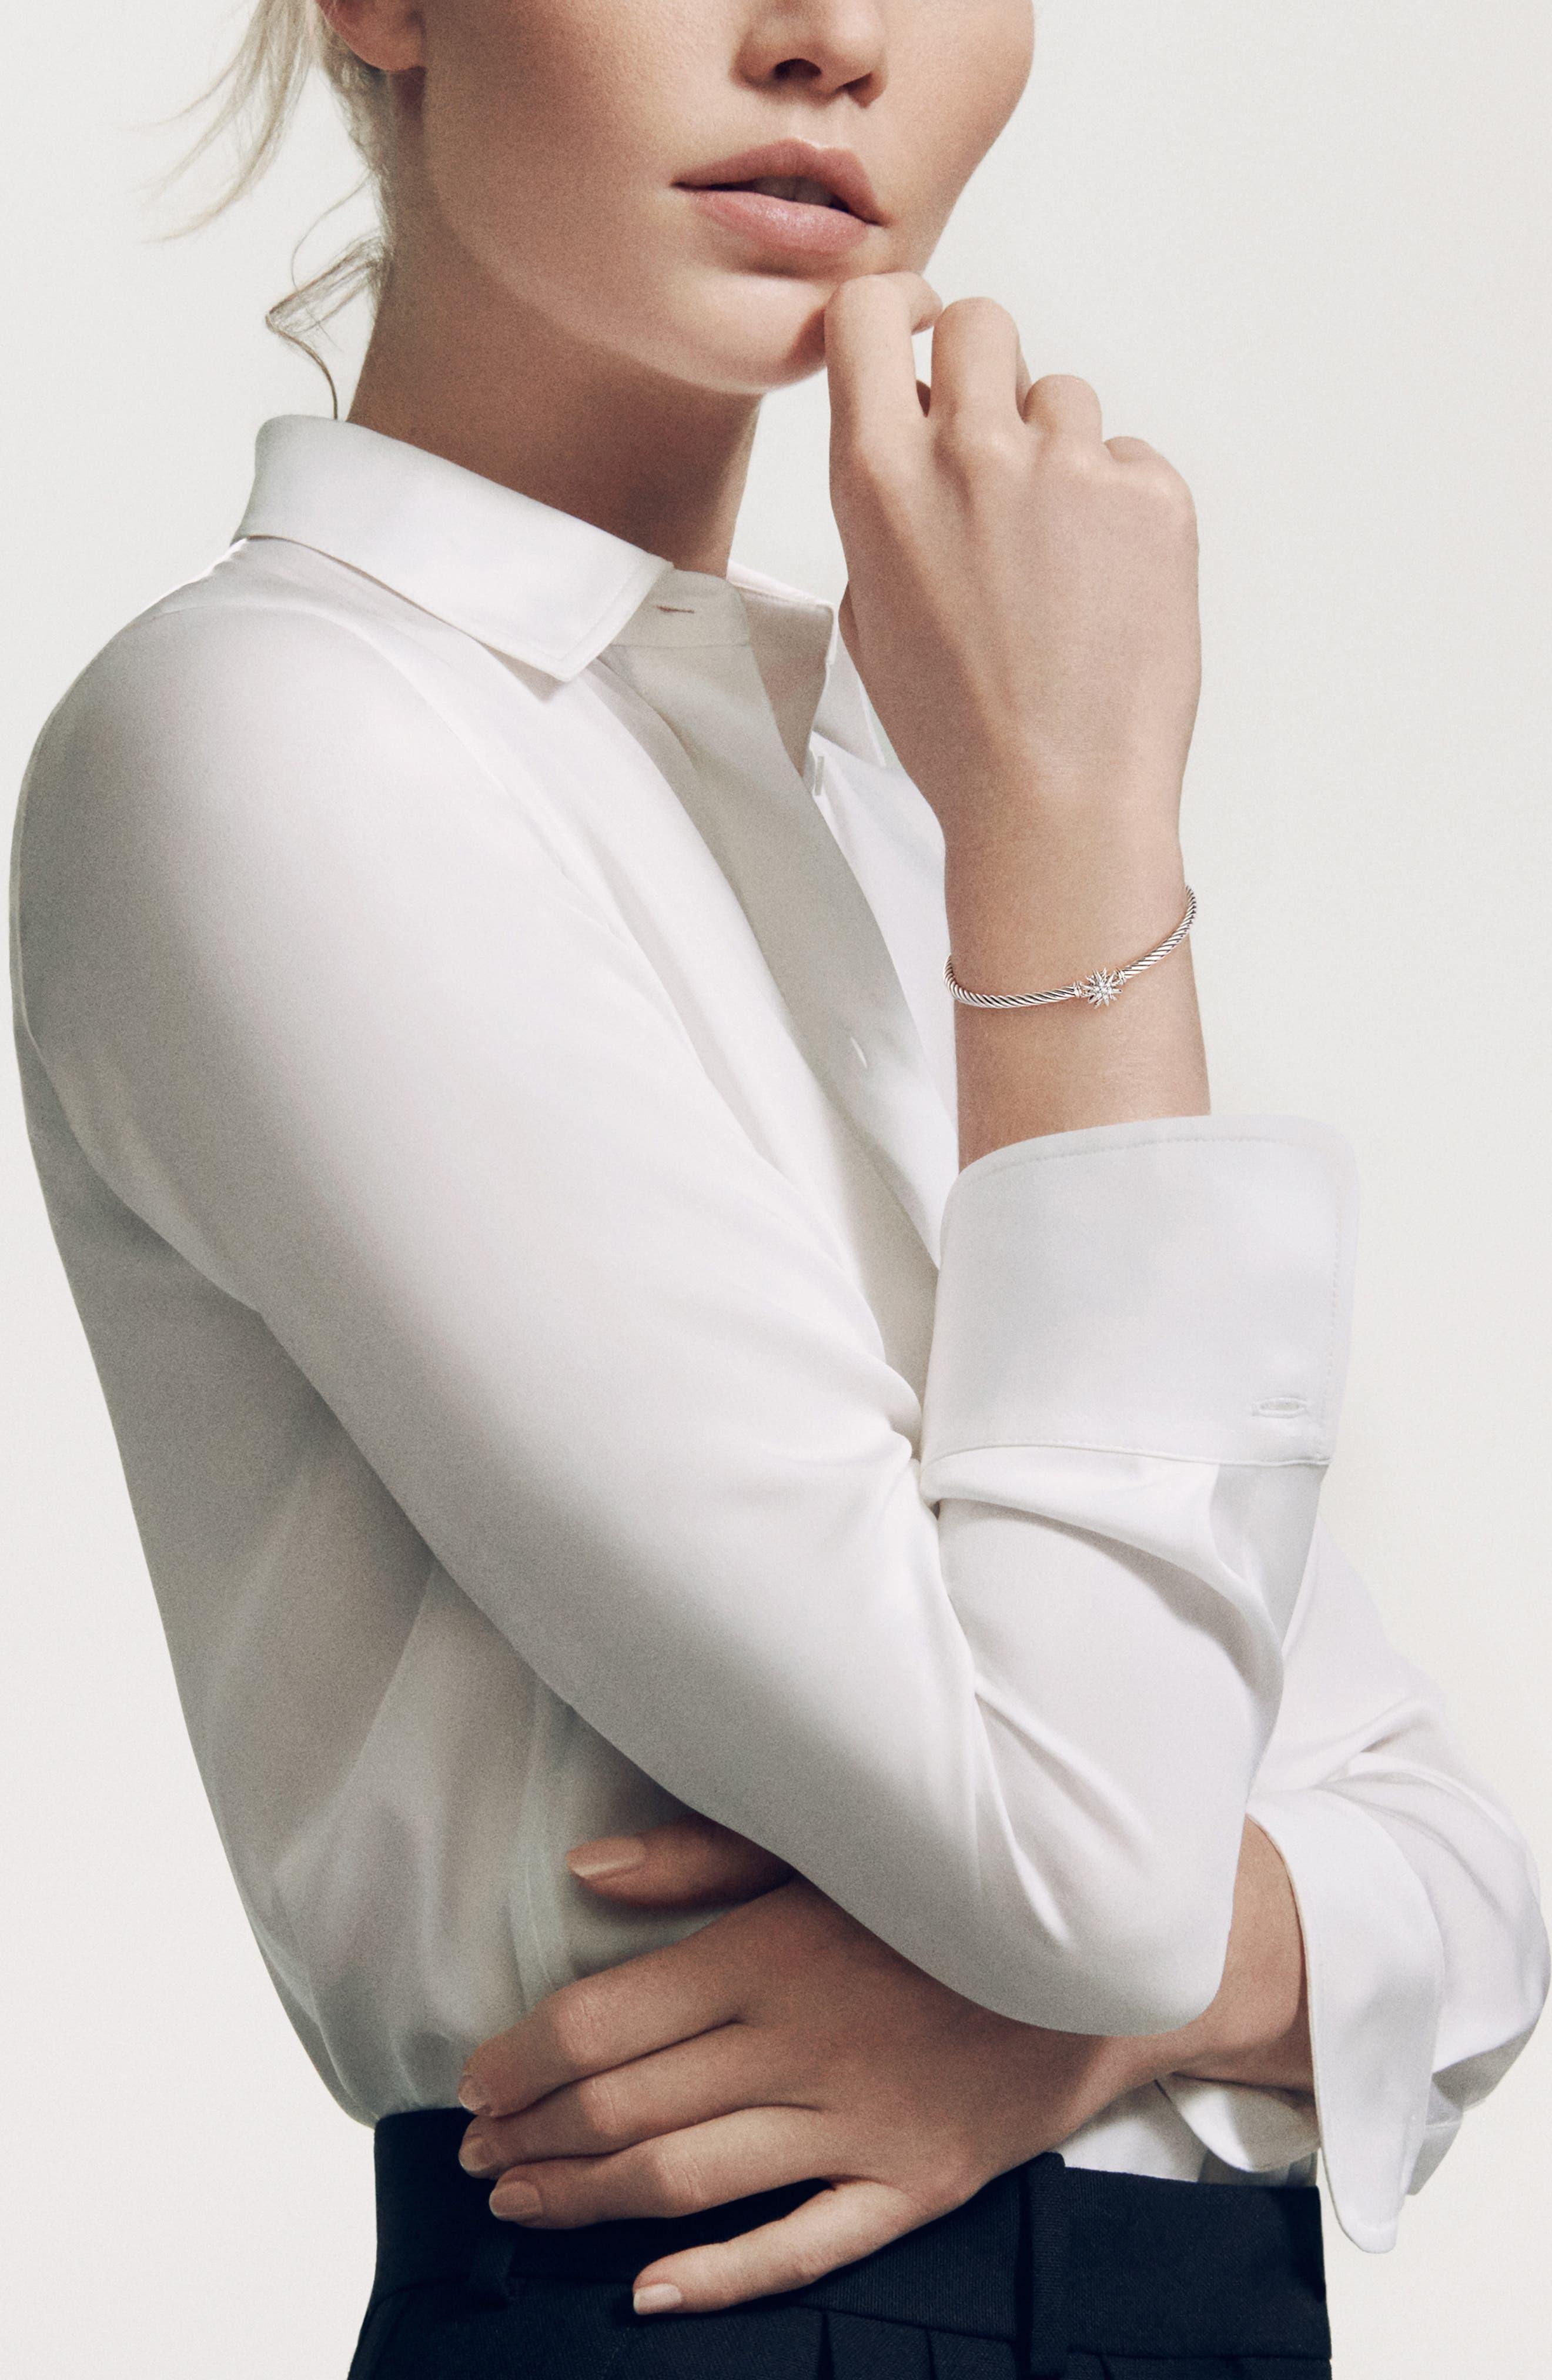 DAVID YURMAN, 'Starburst' Single-Station Bracelet with Diamonds, Alternate thumbnail 2, color, DIAMOND